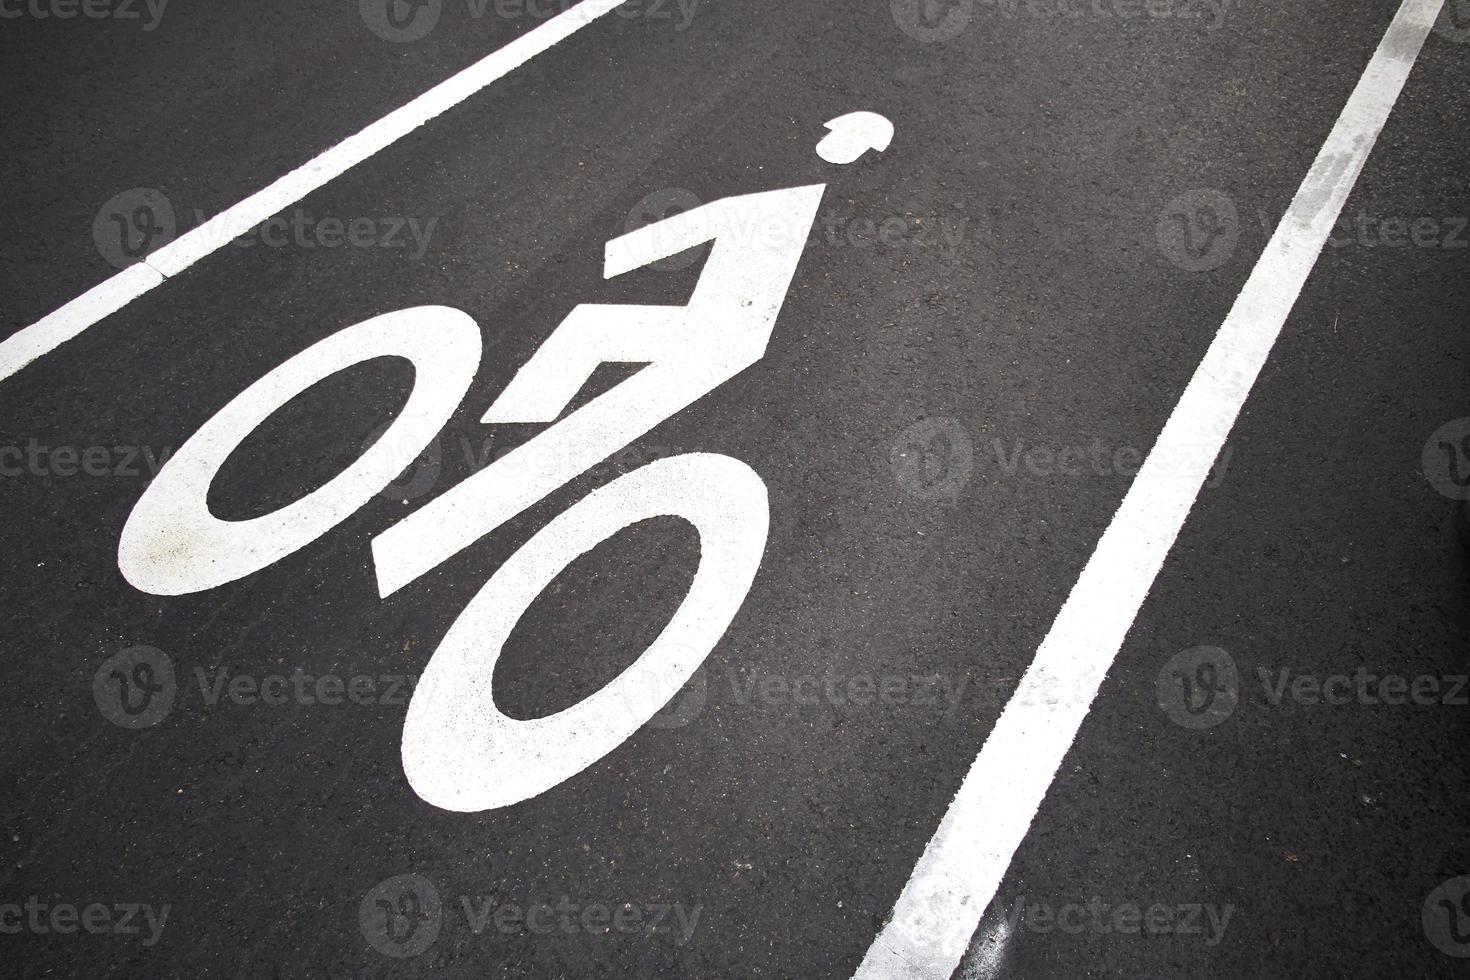 Bicycle Lane harvard cambridge photo